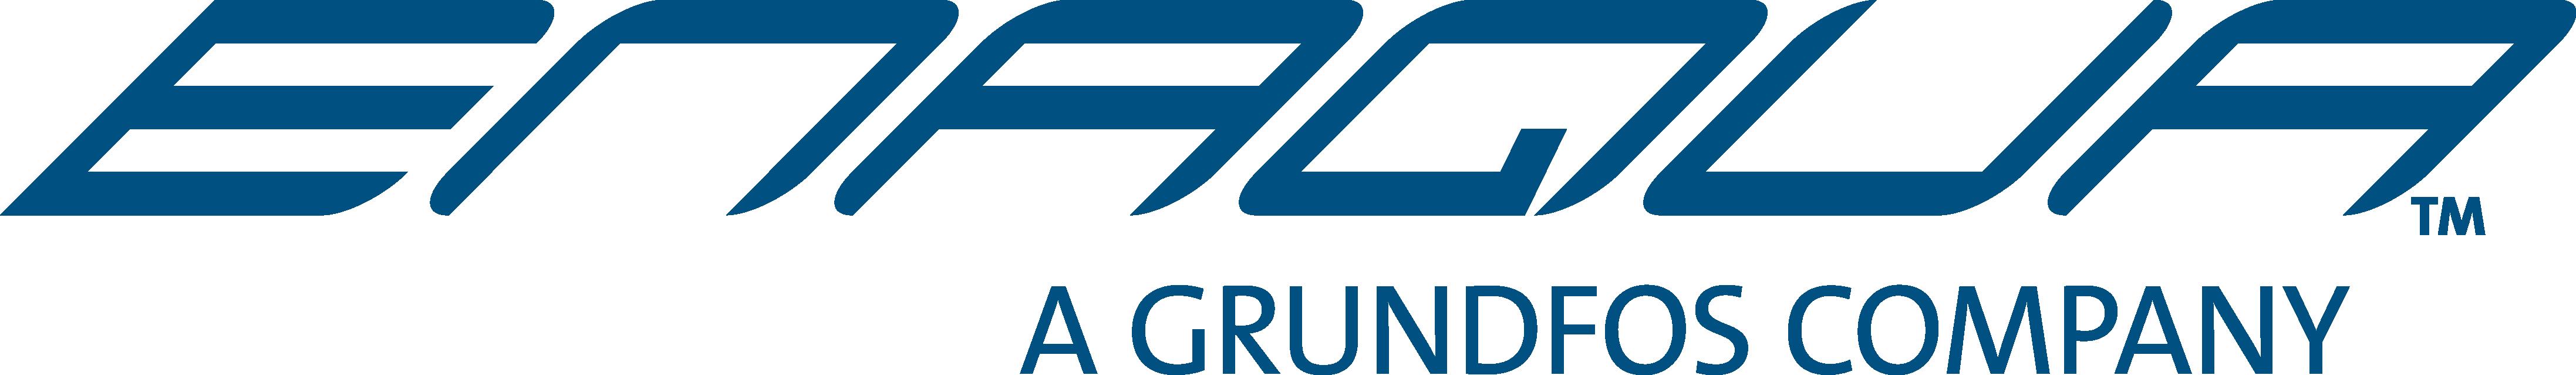 Enaqua - A GRUNDFOS COMPANY